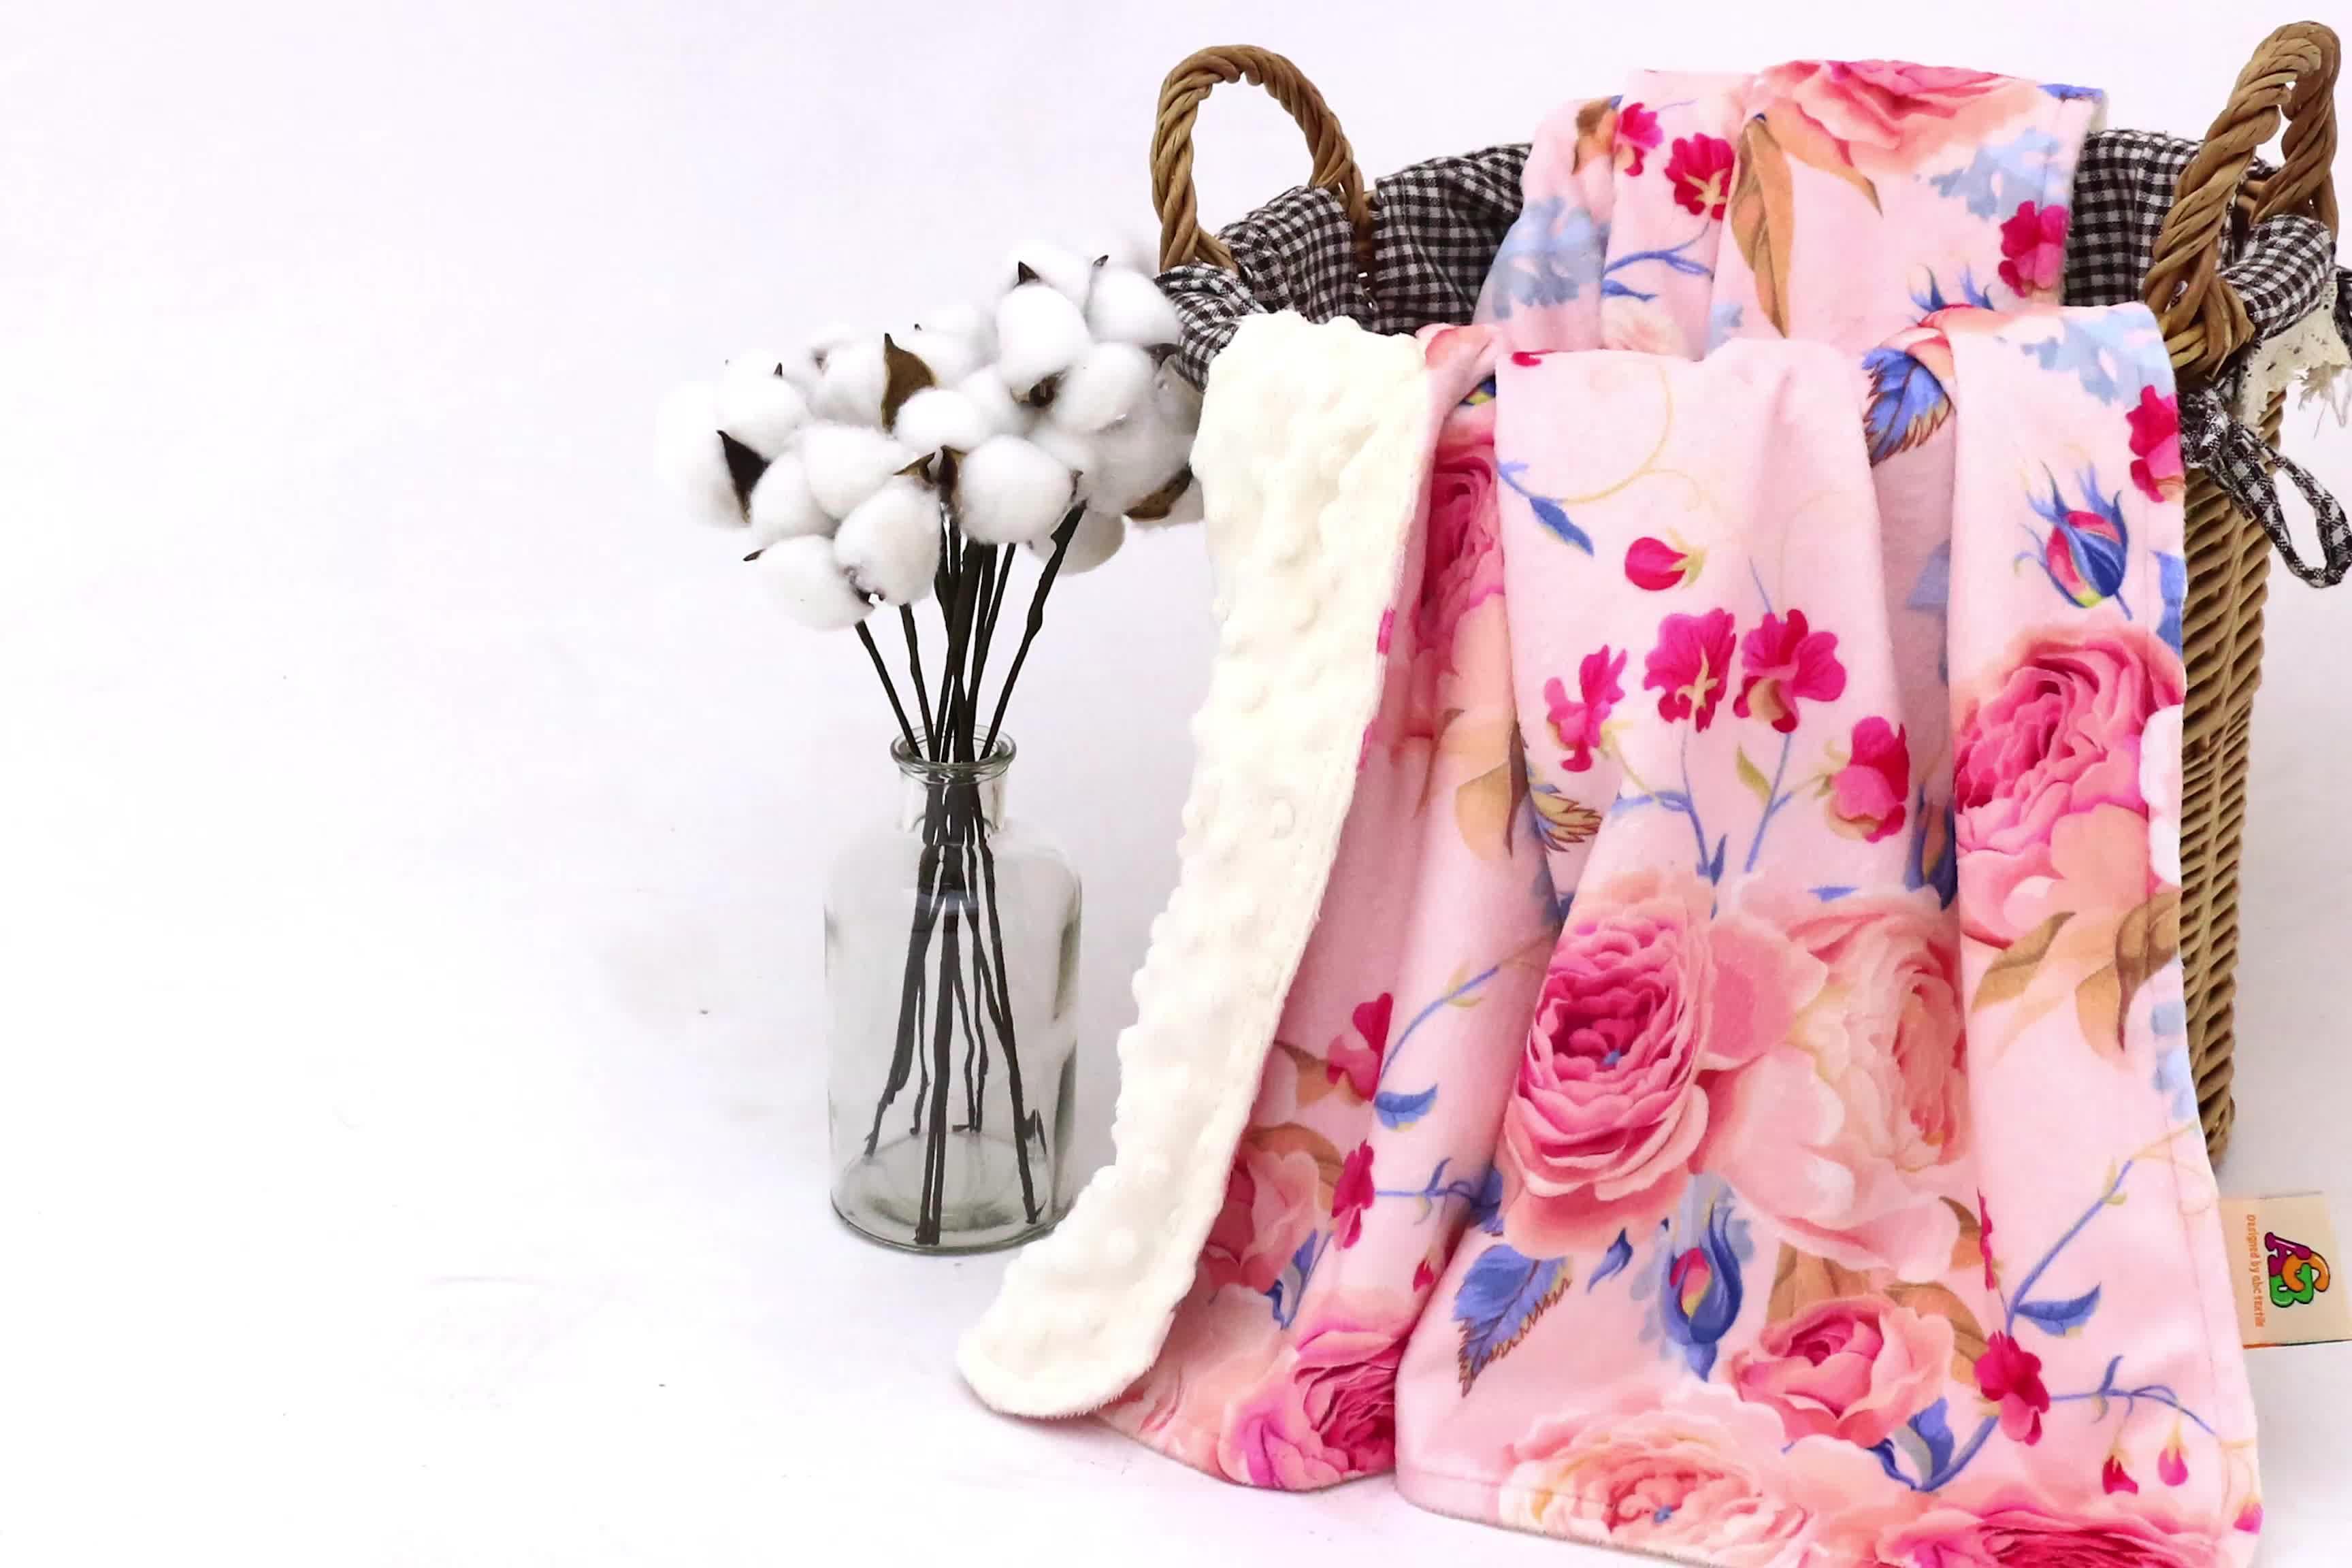 100% polyester super soft high quality custom printed minky satin pink ruffle blanket